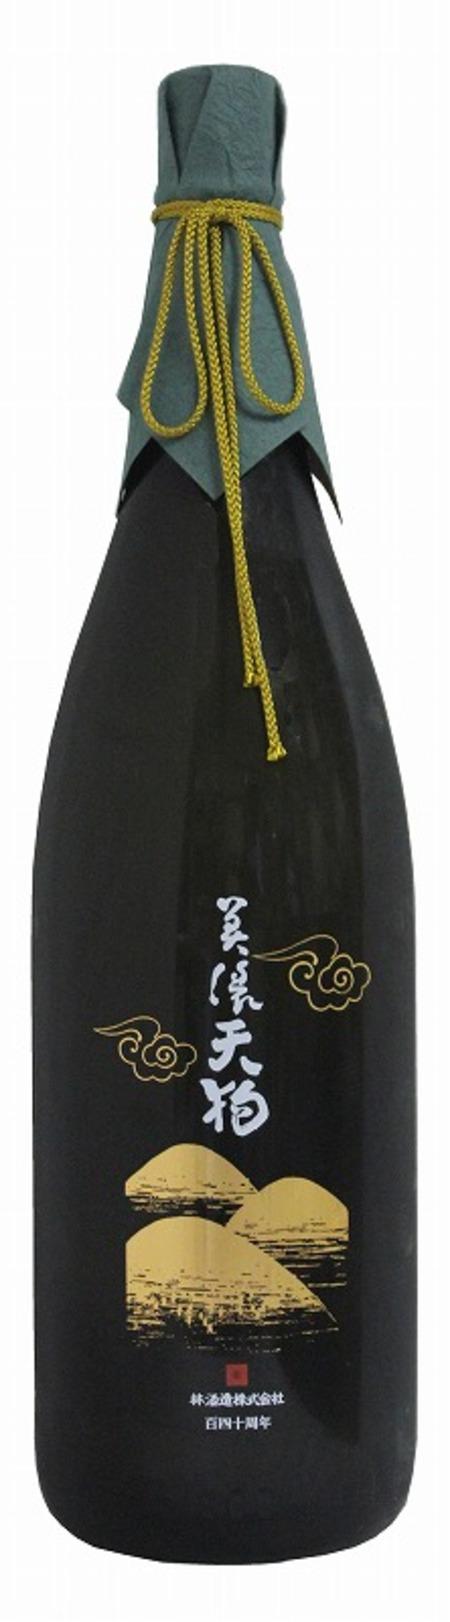 美濃天狗 純米大吟醸 140周年 記年ボトル×1本